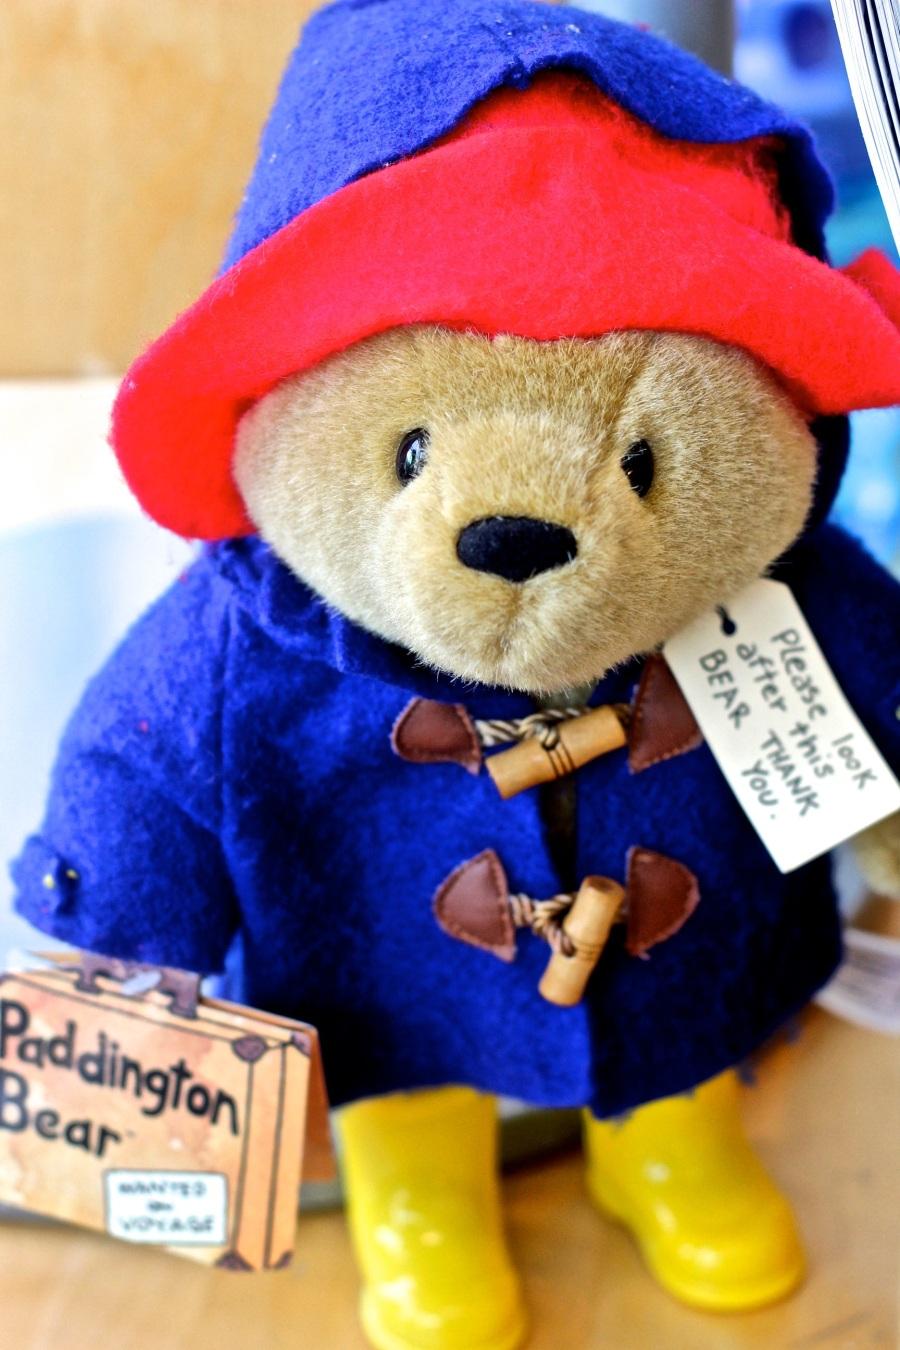 boston childrens museum paddington bear